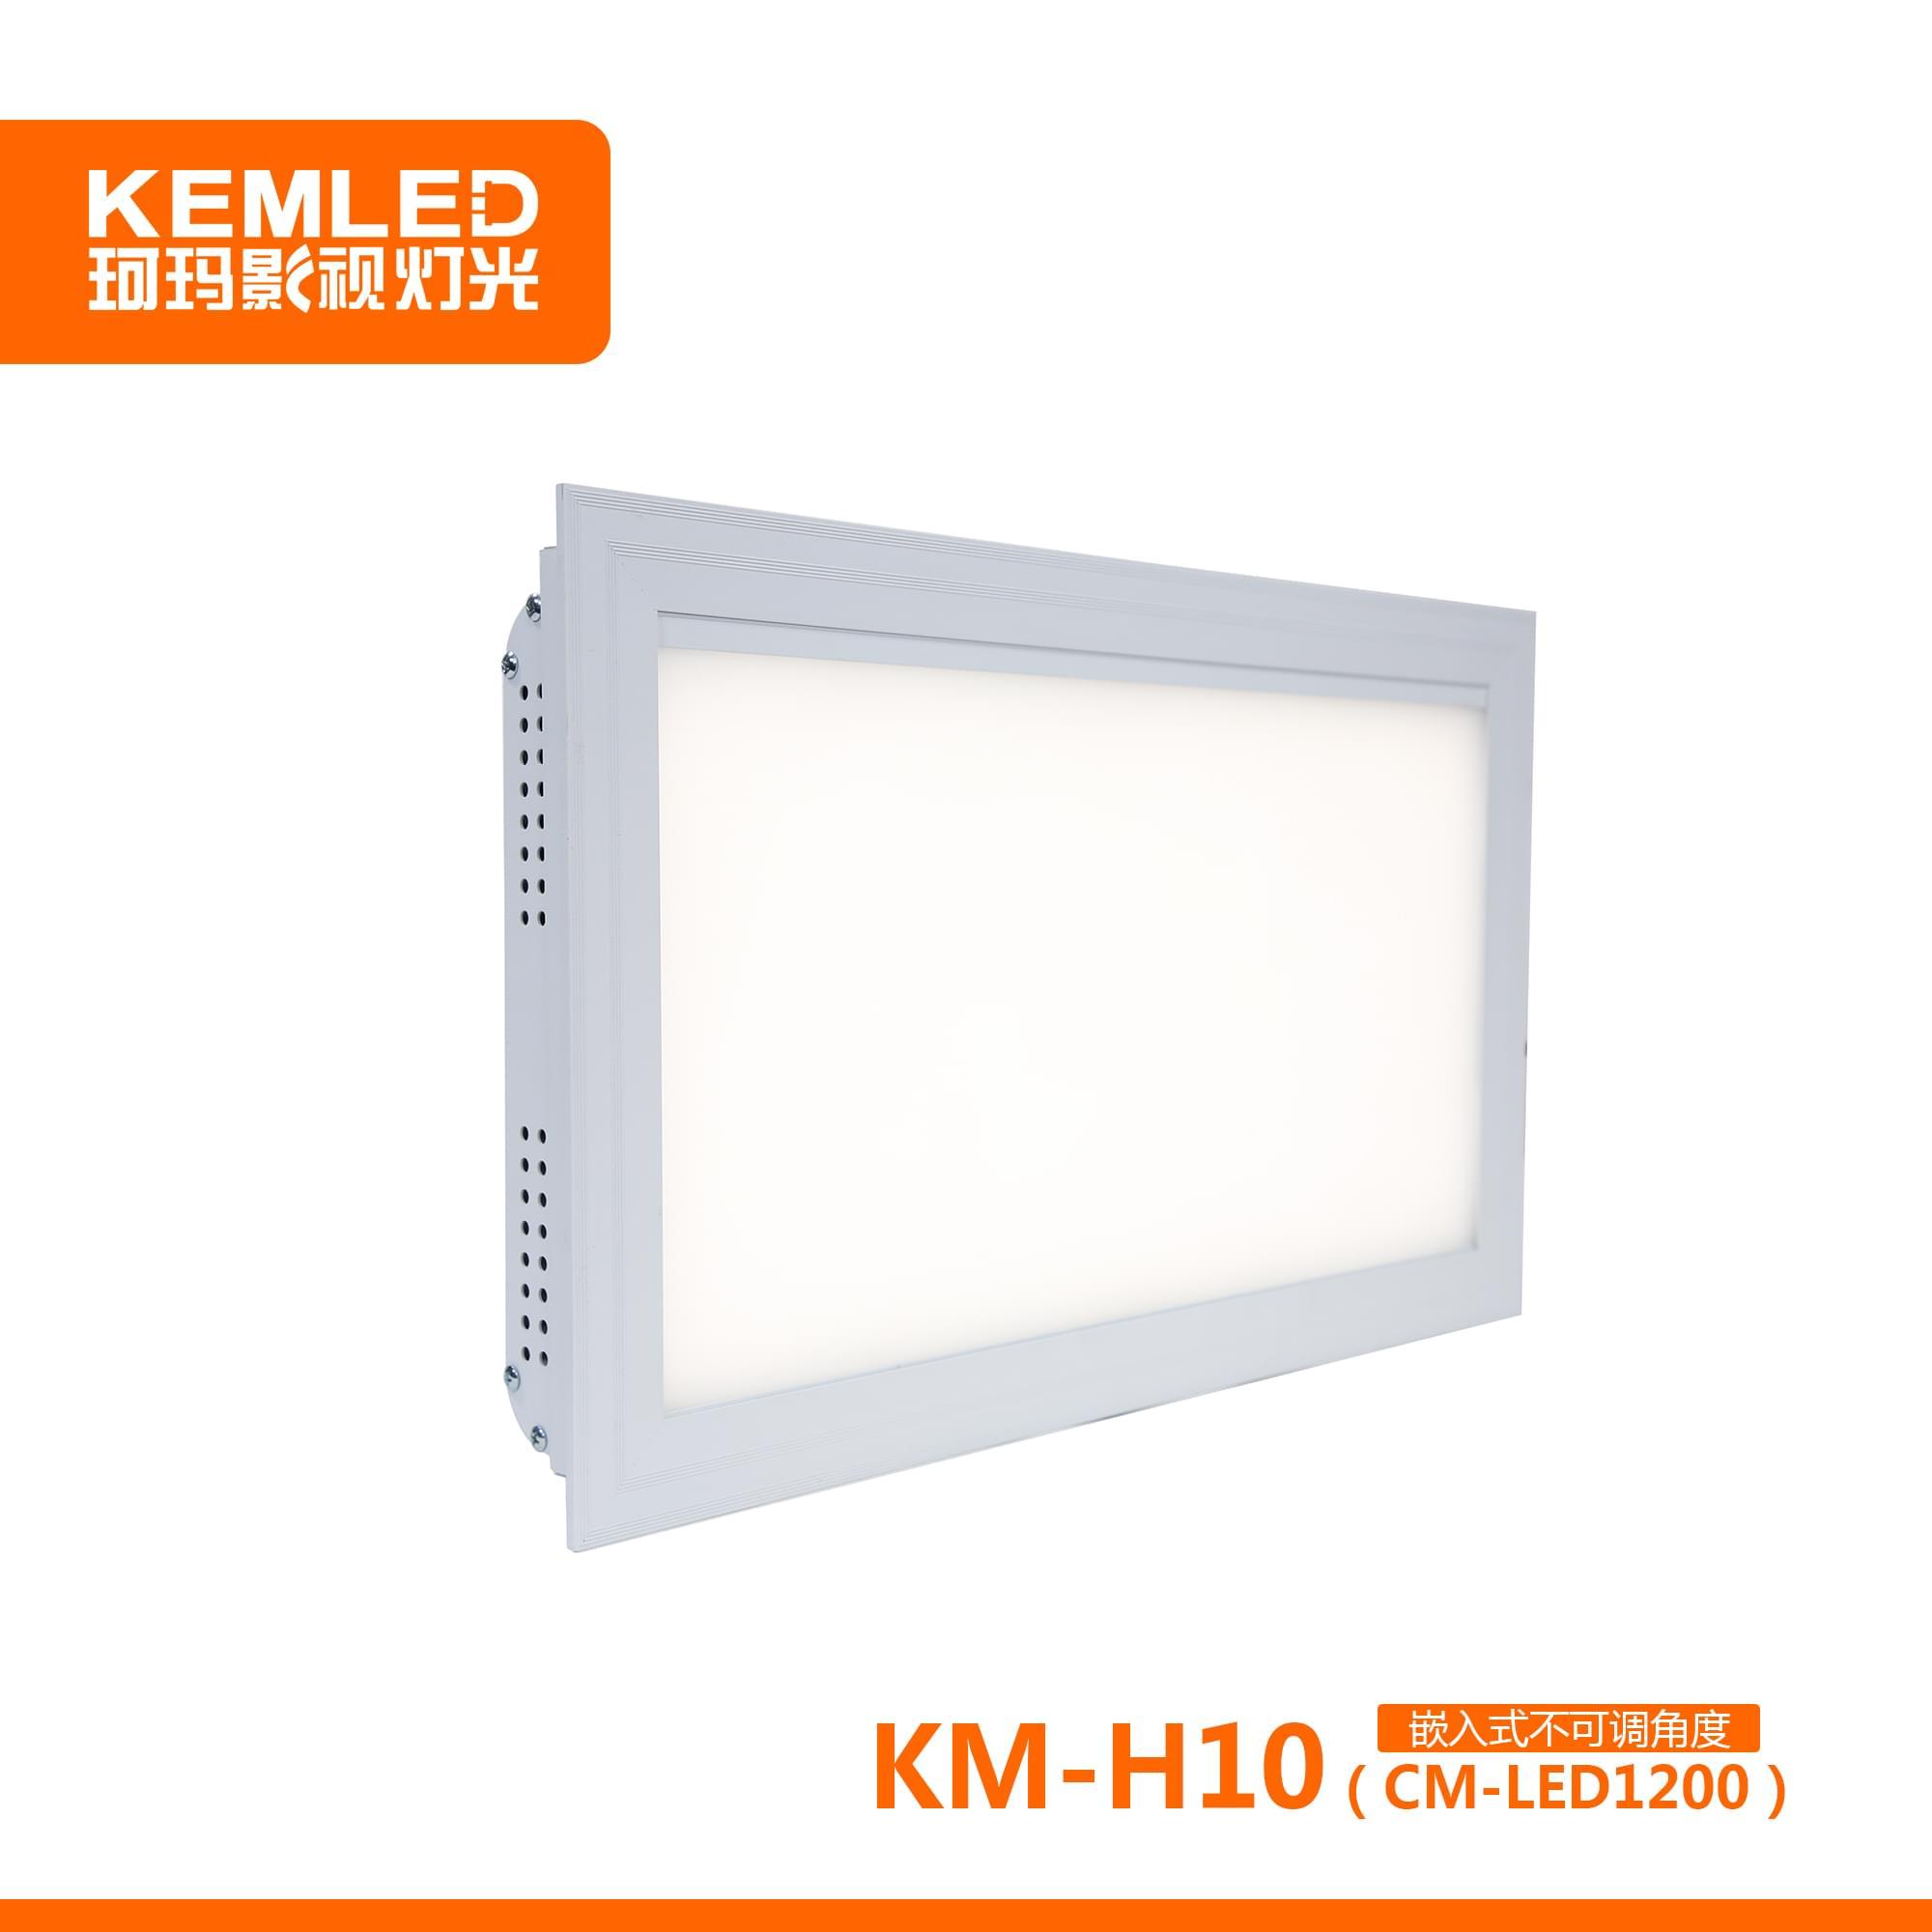 KEMLED 珂玛 KM-H10 不可调角度防黑脸嵌入式会议室灯